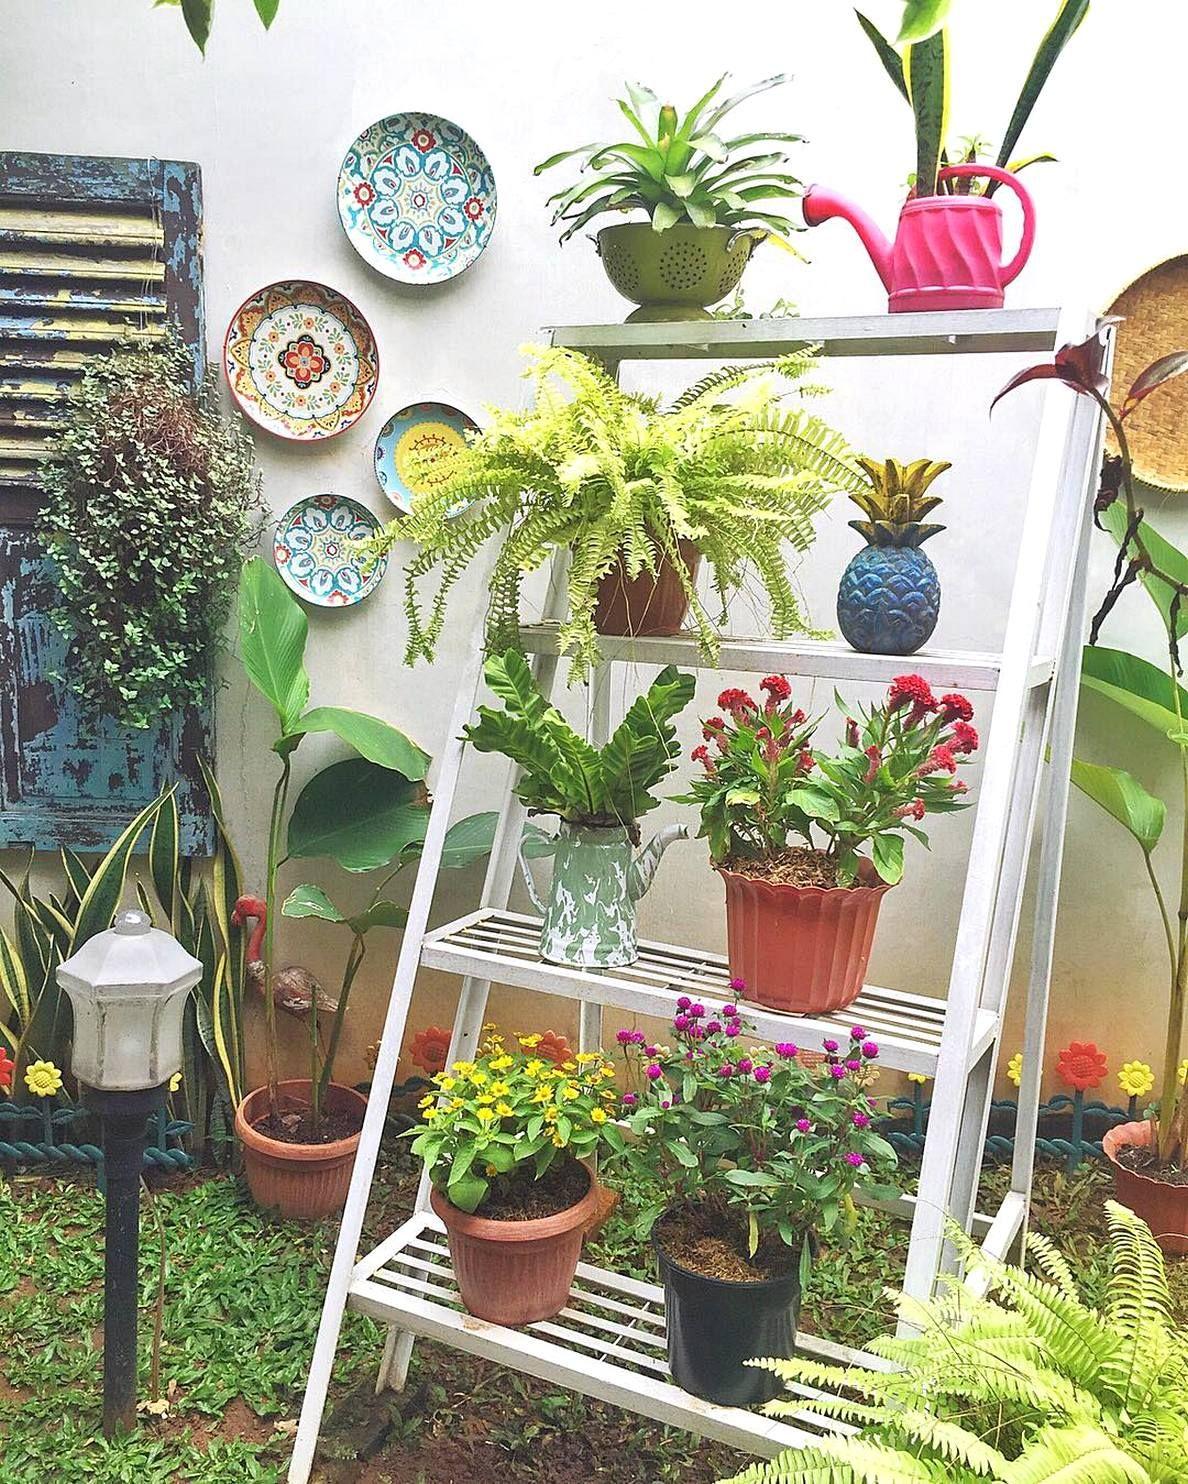 Taman Rumah Minimalis Kecil Terbaru Plantz Stylized In 2018